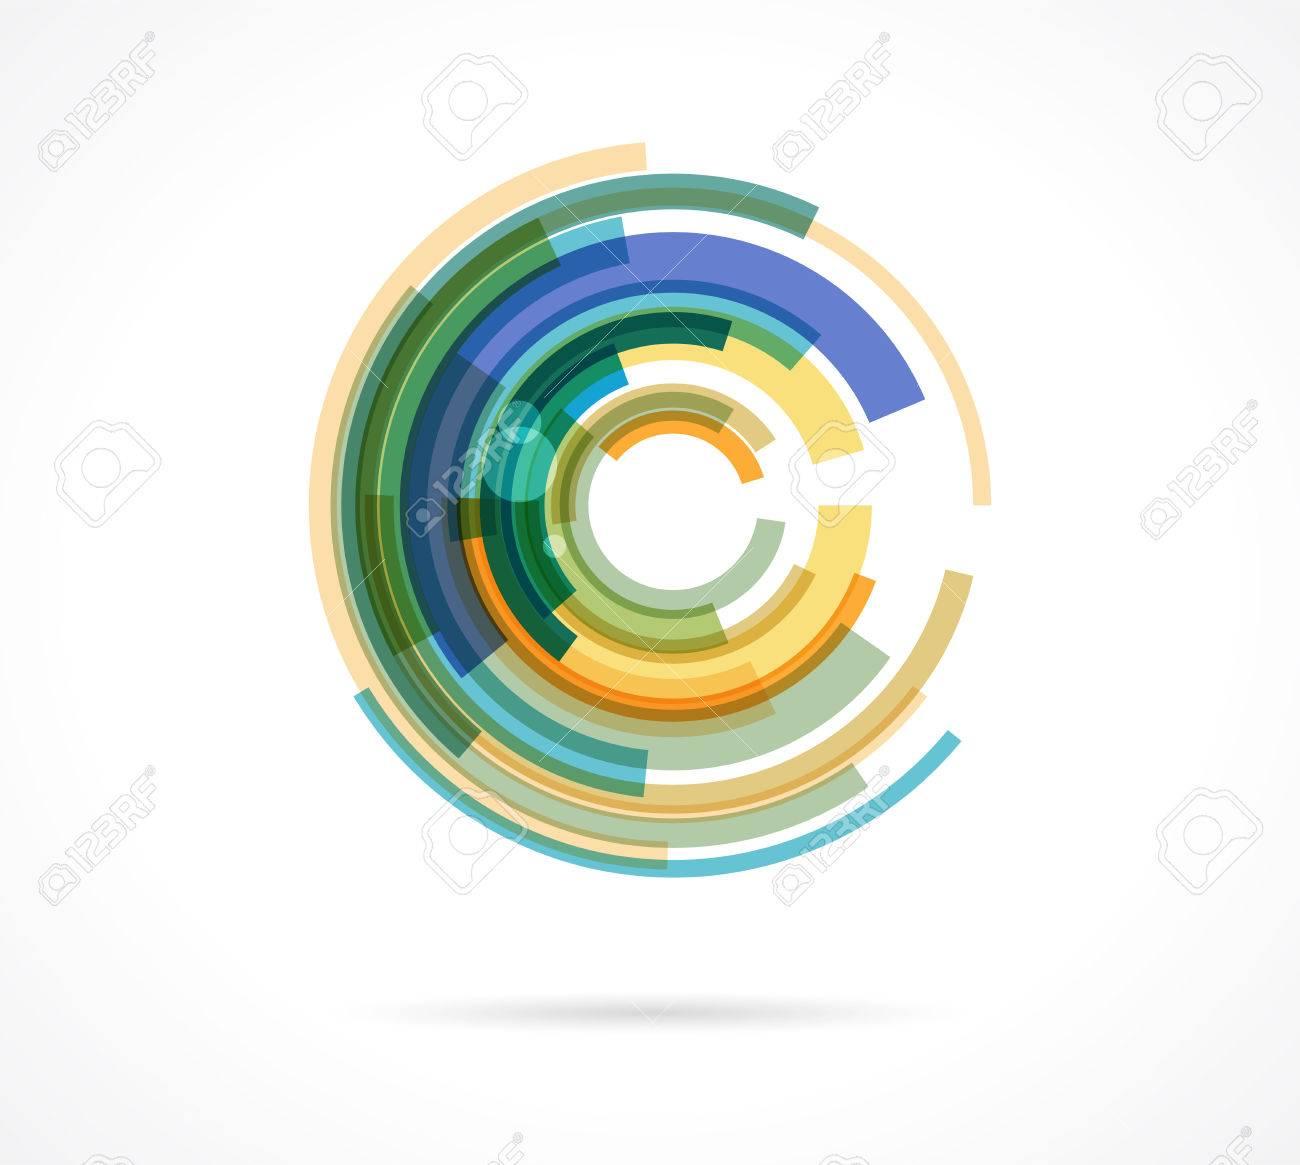 Set of colorful eye icons - 41200954